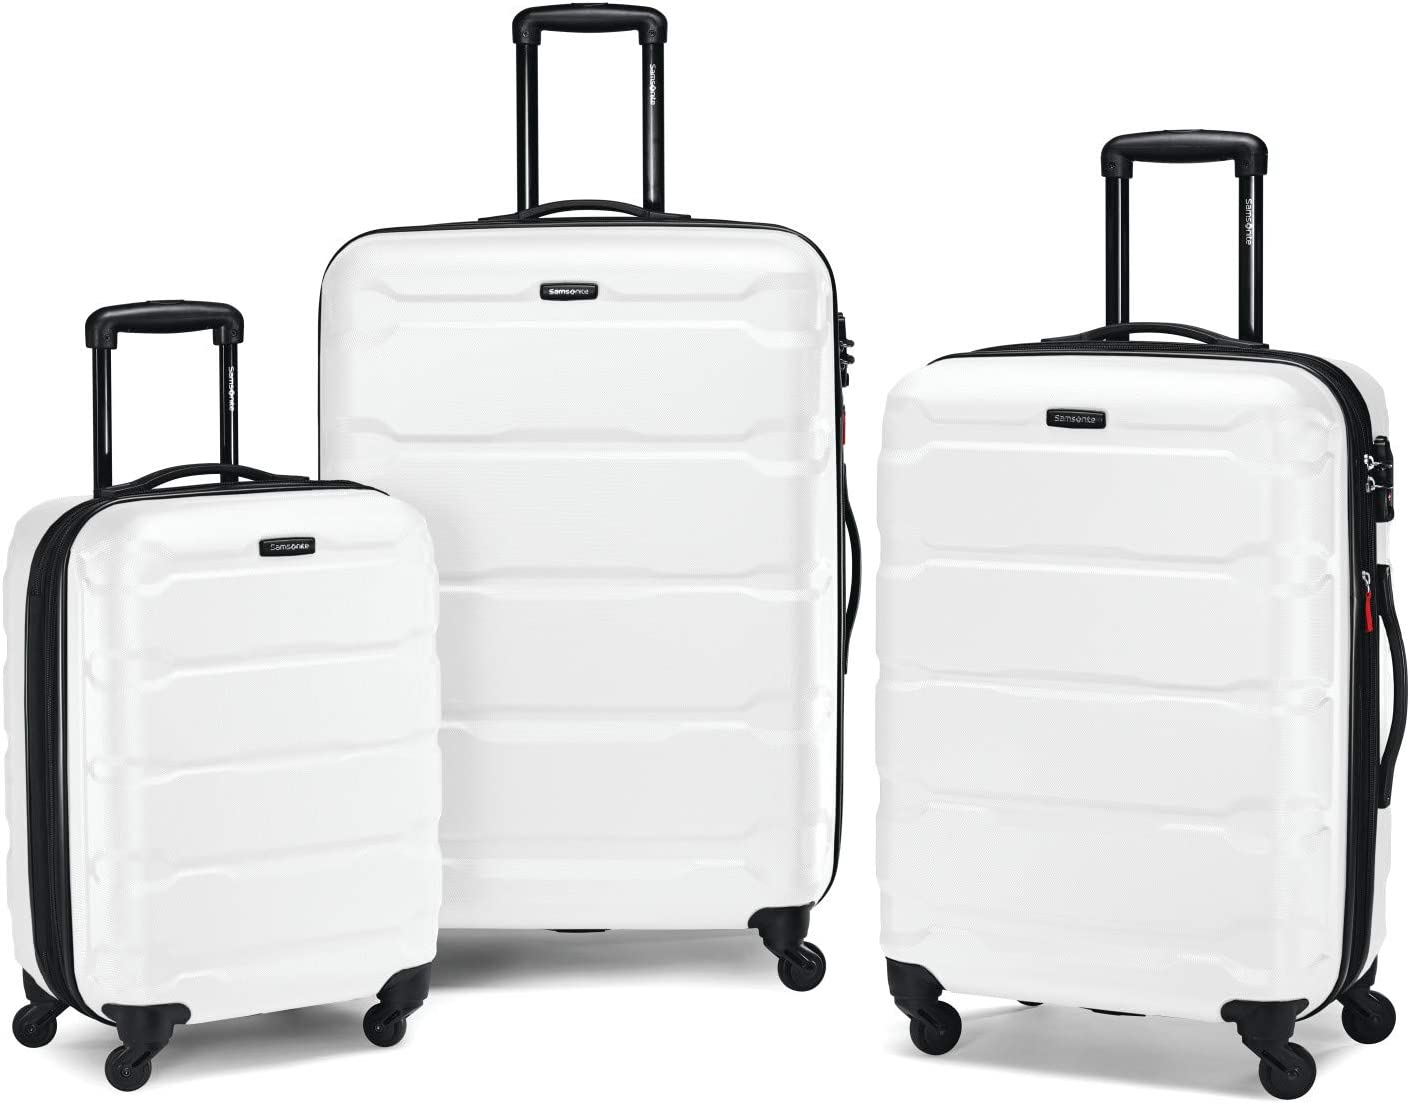 Samsonite Omni PC Hardside Expandable Luggage with Spinner Wheels, White, 3-Piece Set (20/24/28)